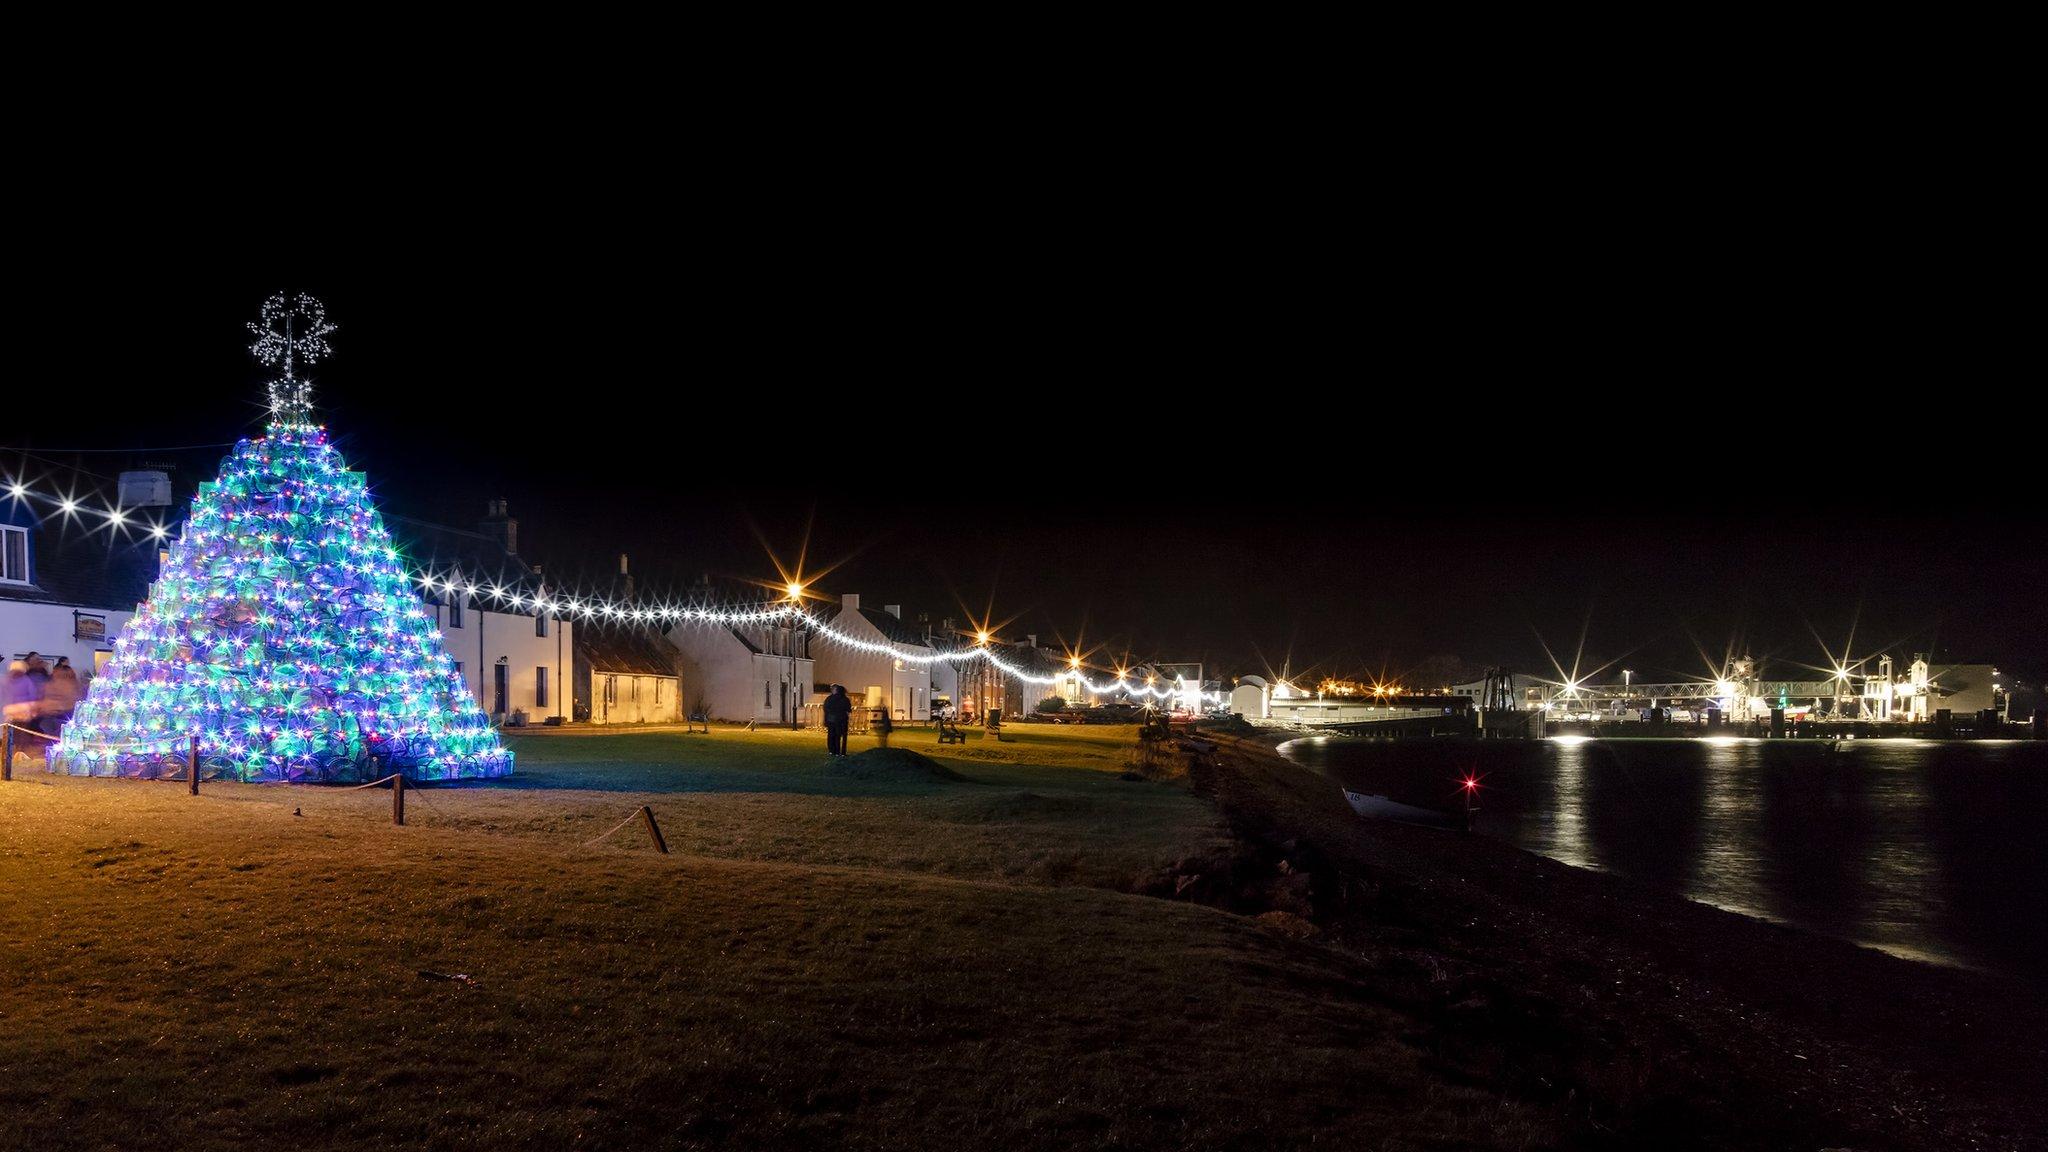 CalMac ferry 'turns on' Ullapool's Christmas lights